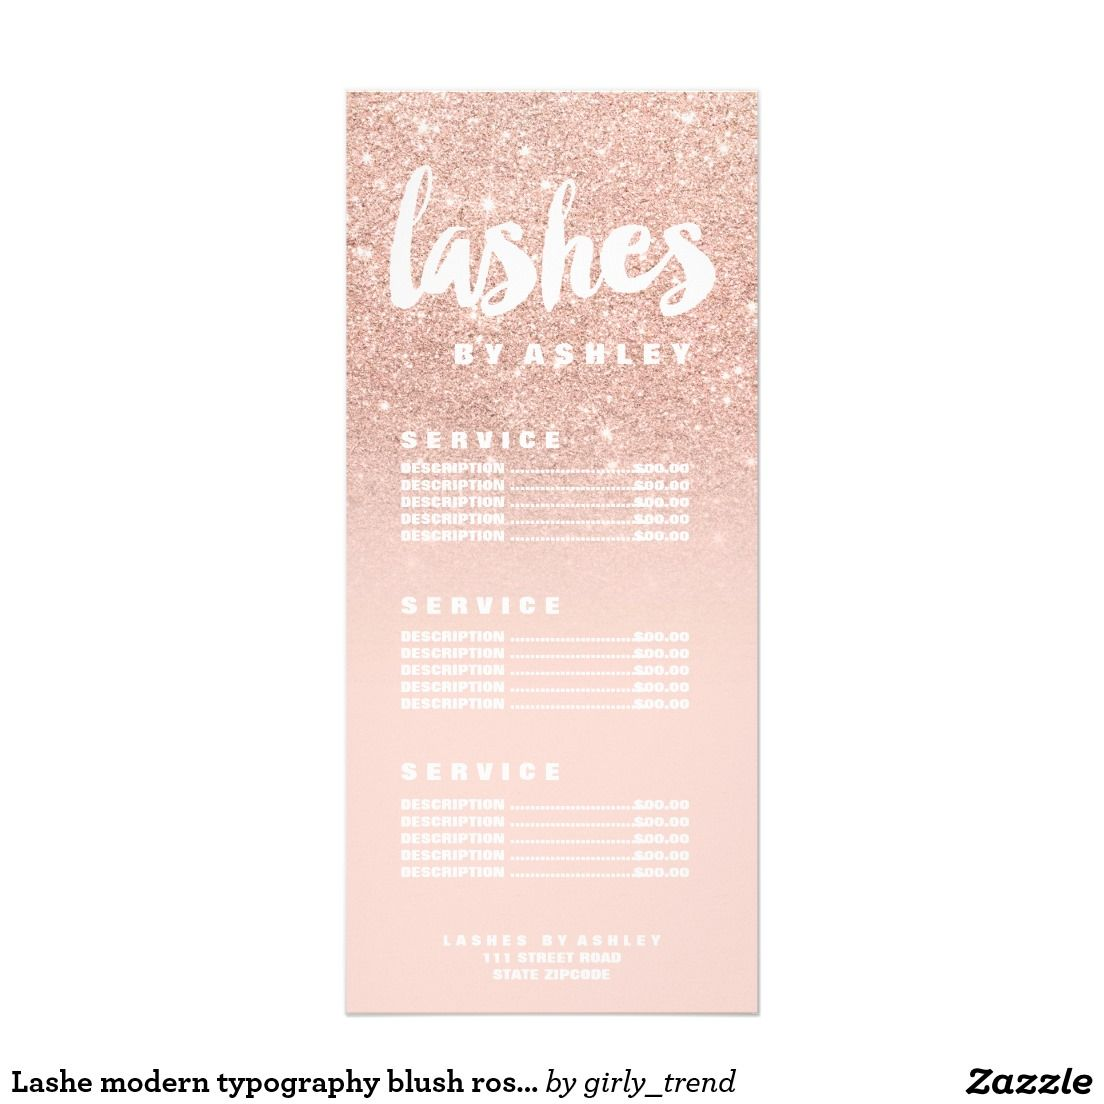 Lashe modern typography blush rose gold price list rack